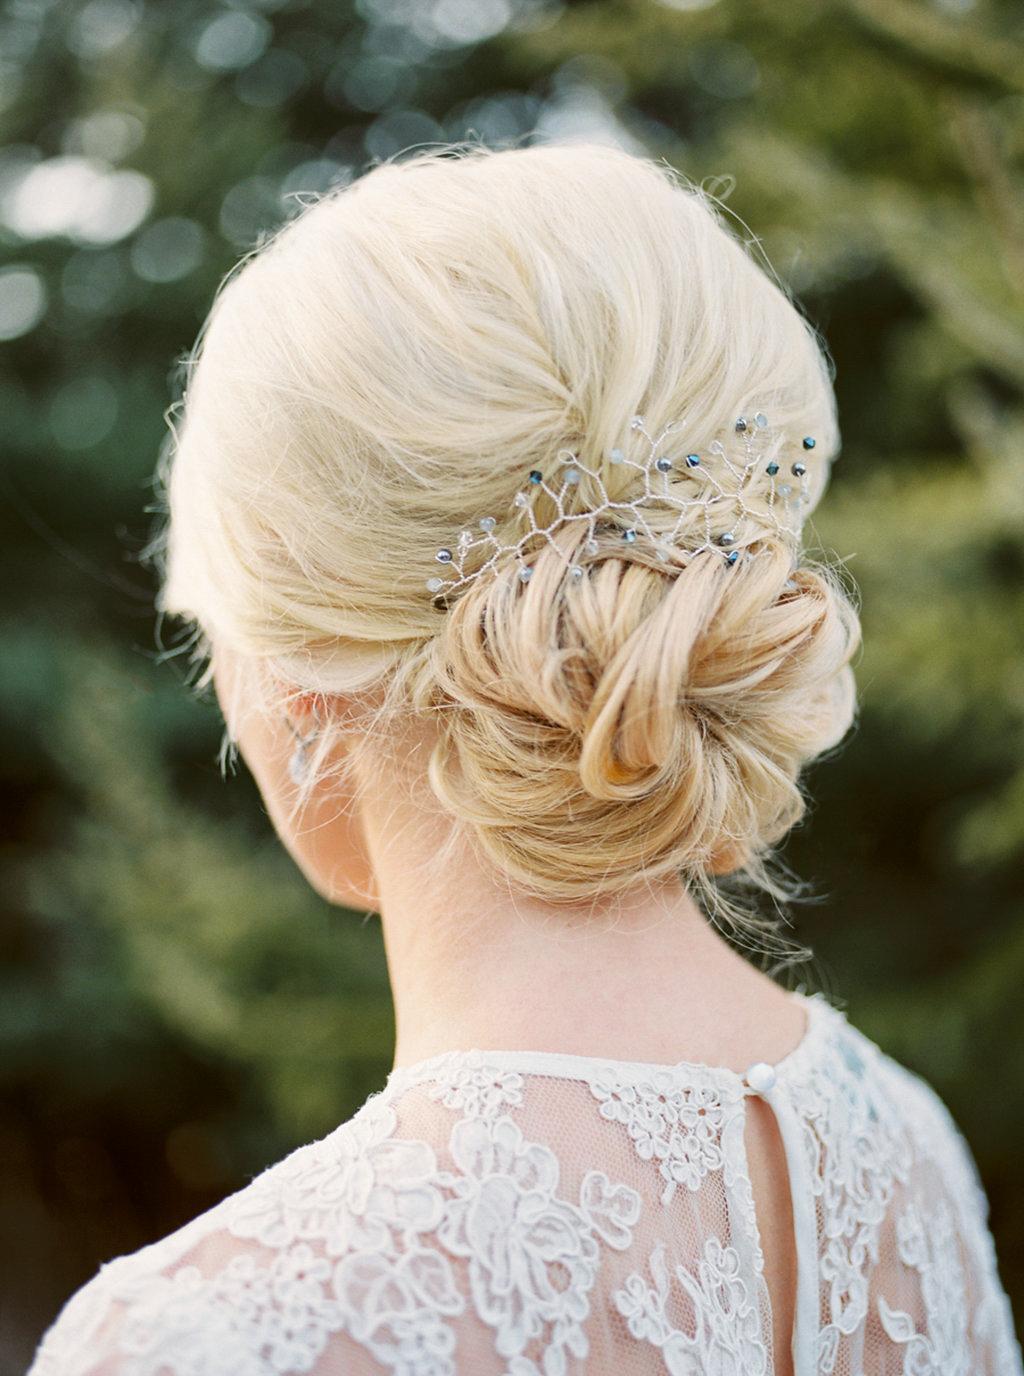 kayla-yestal-photography-vineyard-bride-swish-list-beamer-falls-manor-grimsby-engagement-11.jpg